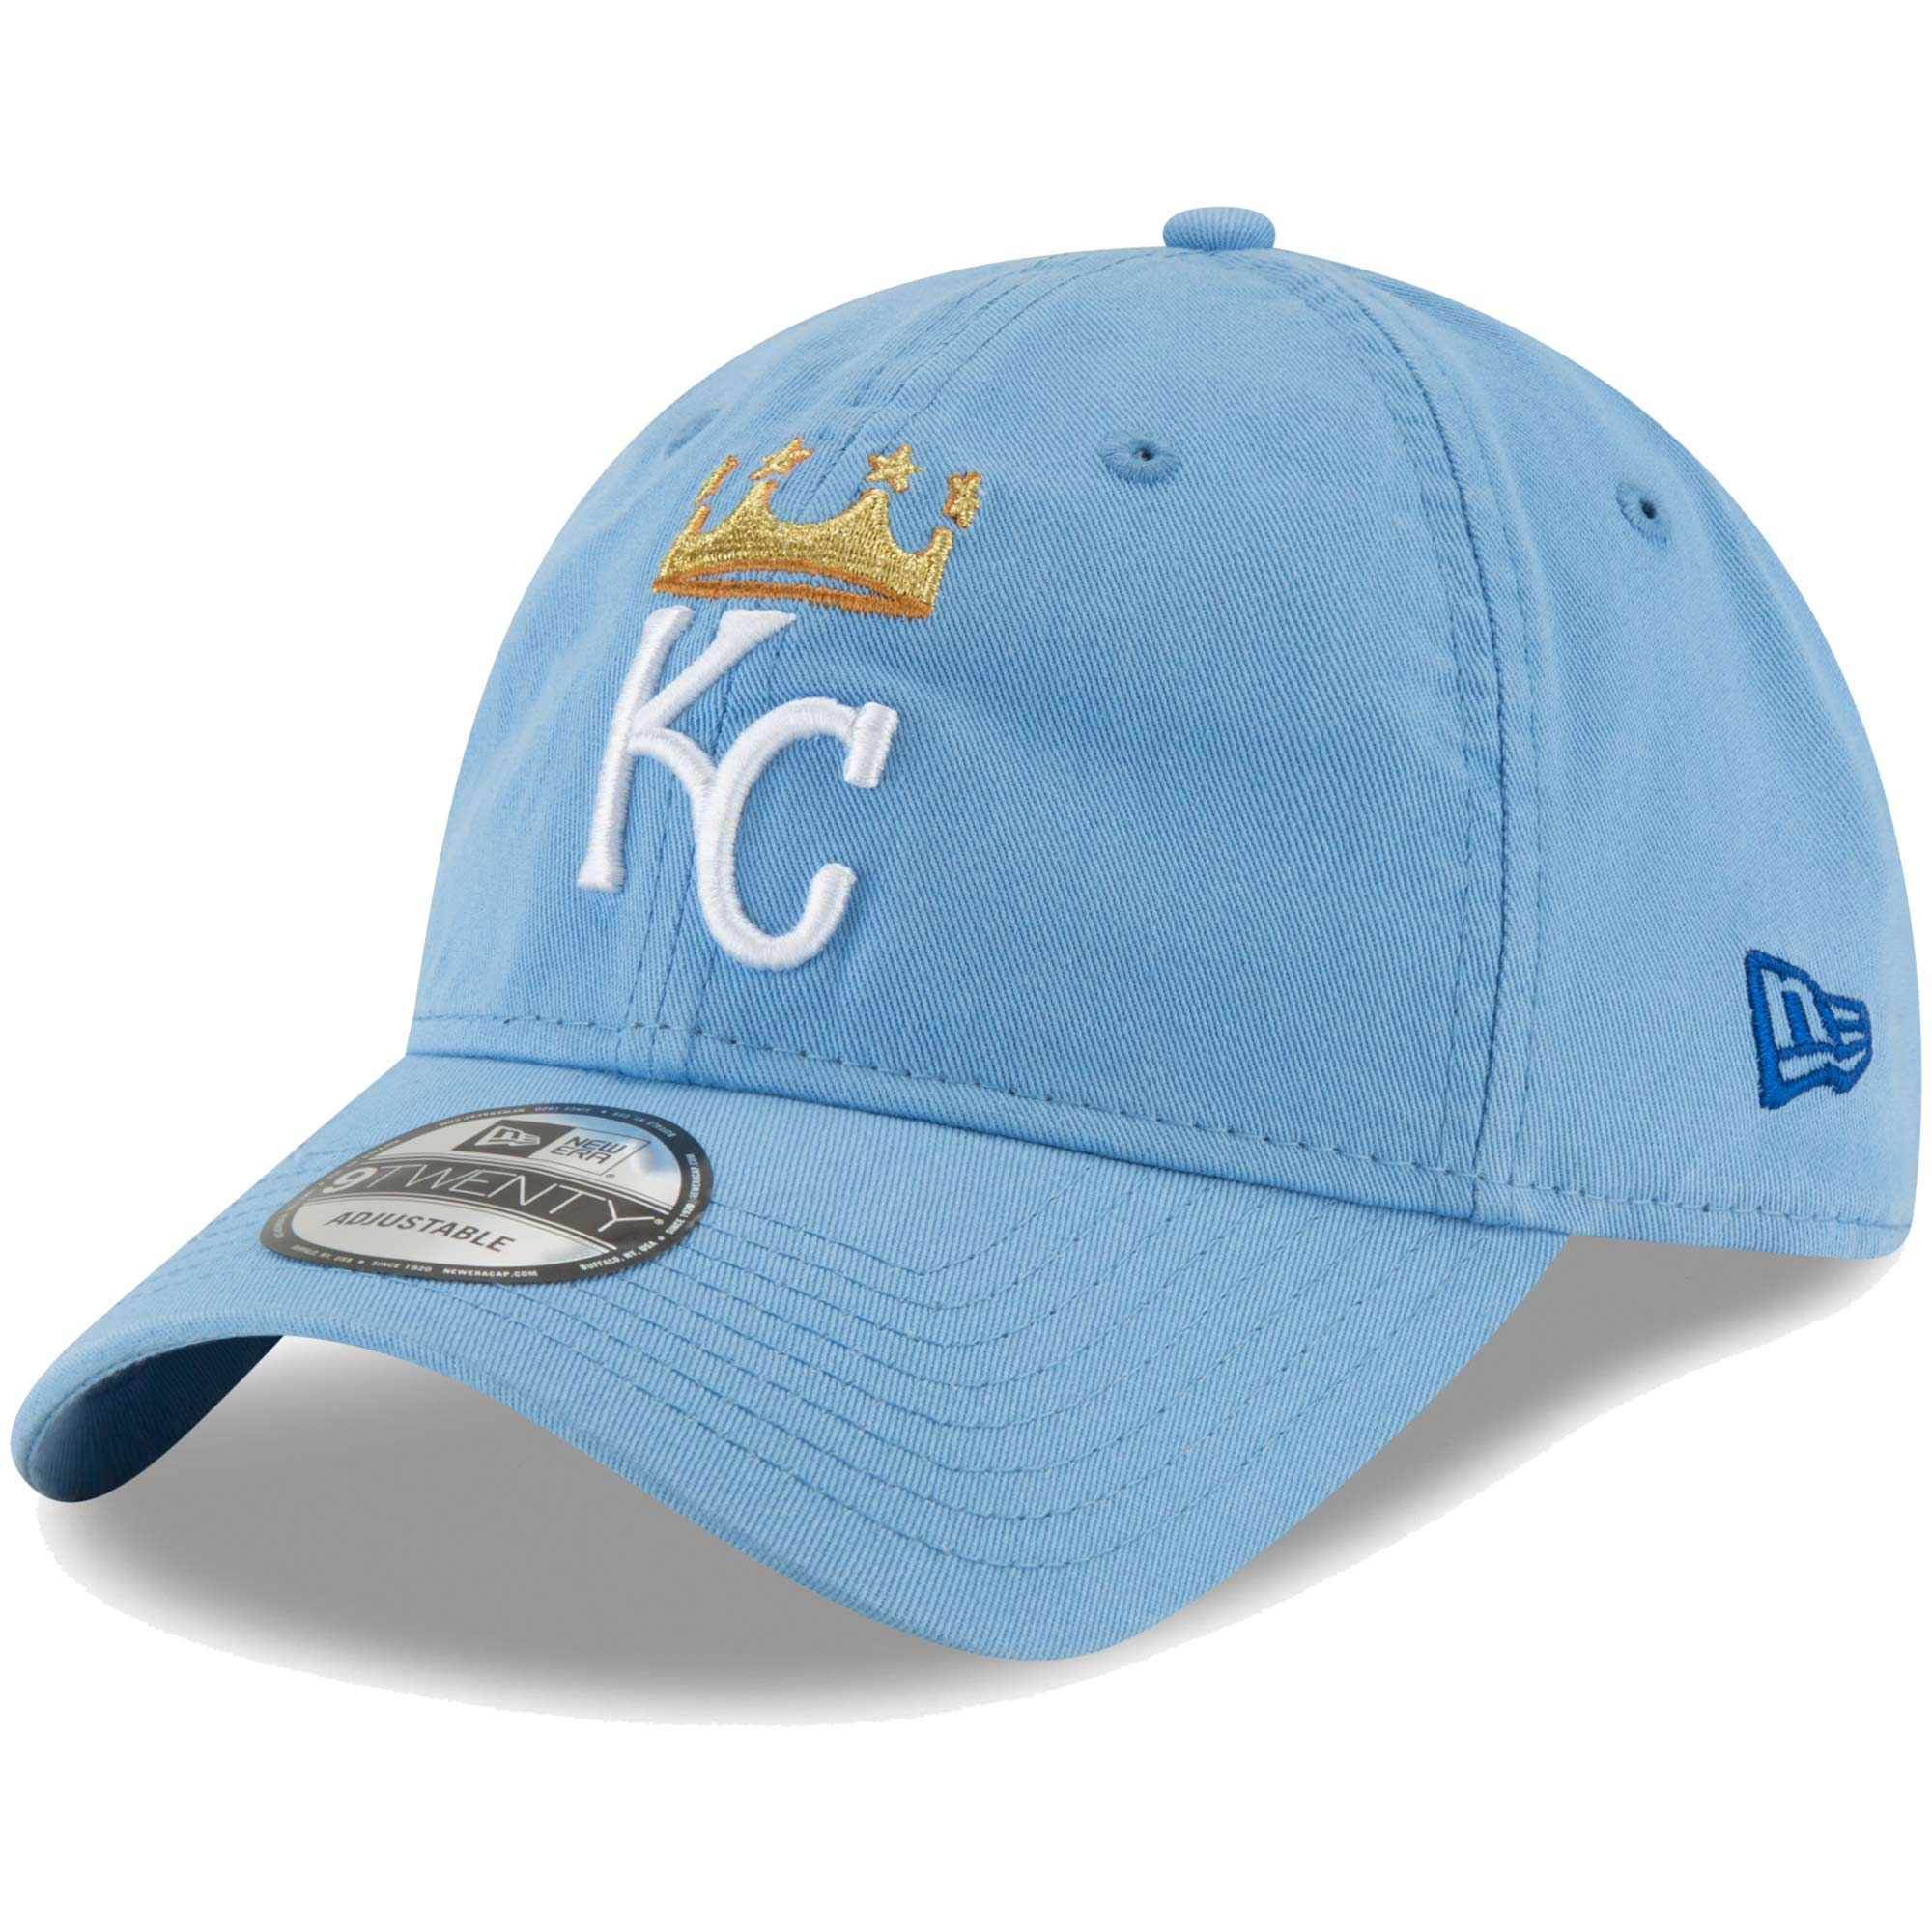 Kansas City Royals New Era Core Classic 9TWENTY Adjustable Hat - Light Blue - OSFA